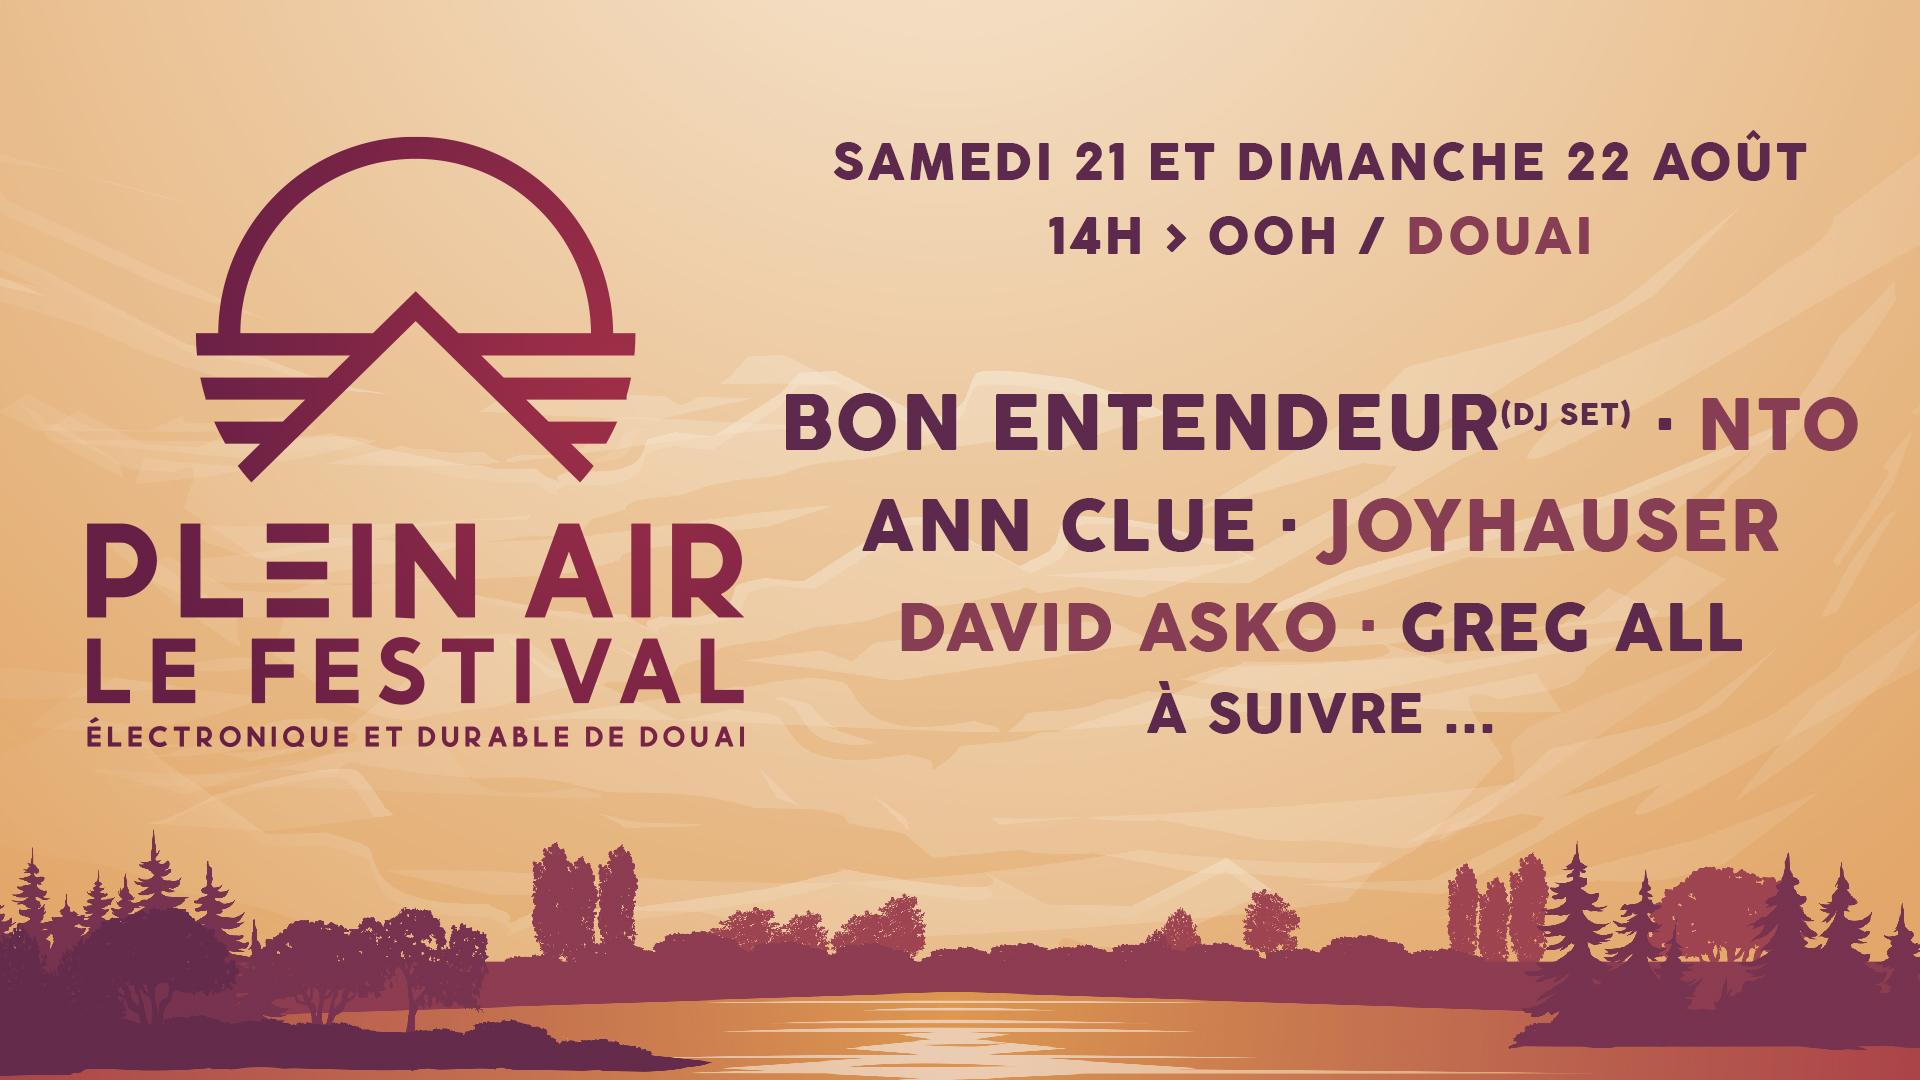 Plein Air Festival - Douai - Bon Entendeur, NTO & more